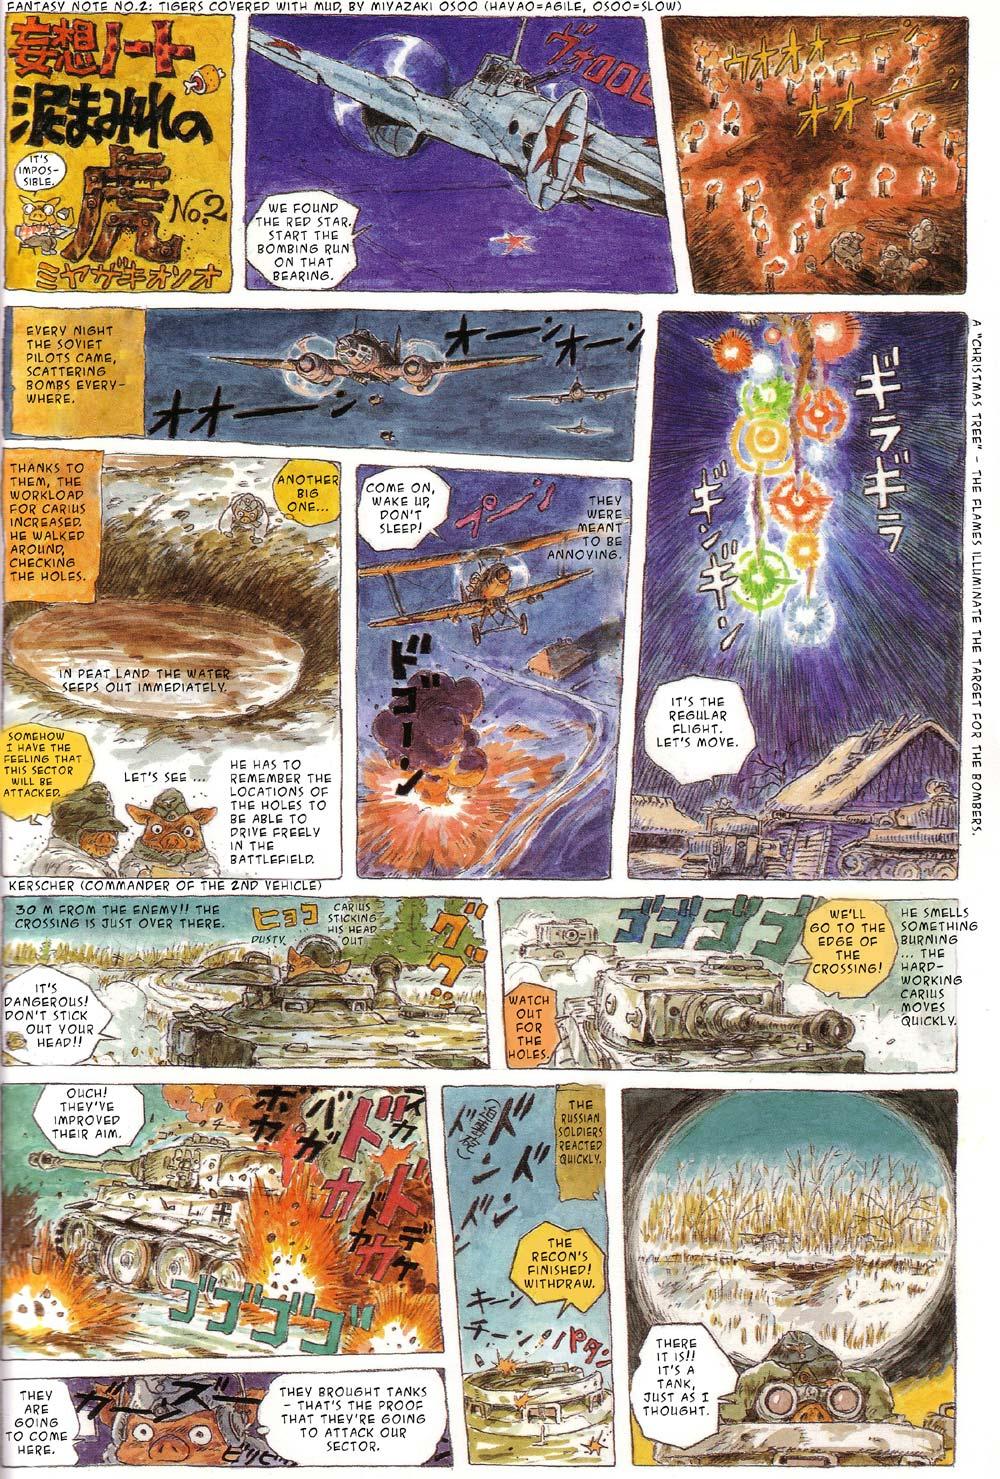 miyazaki comic